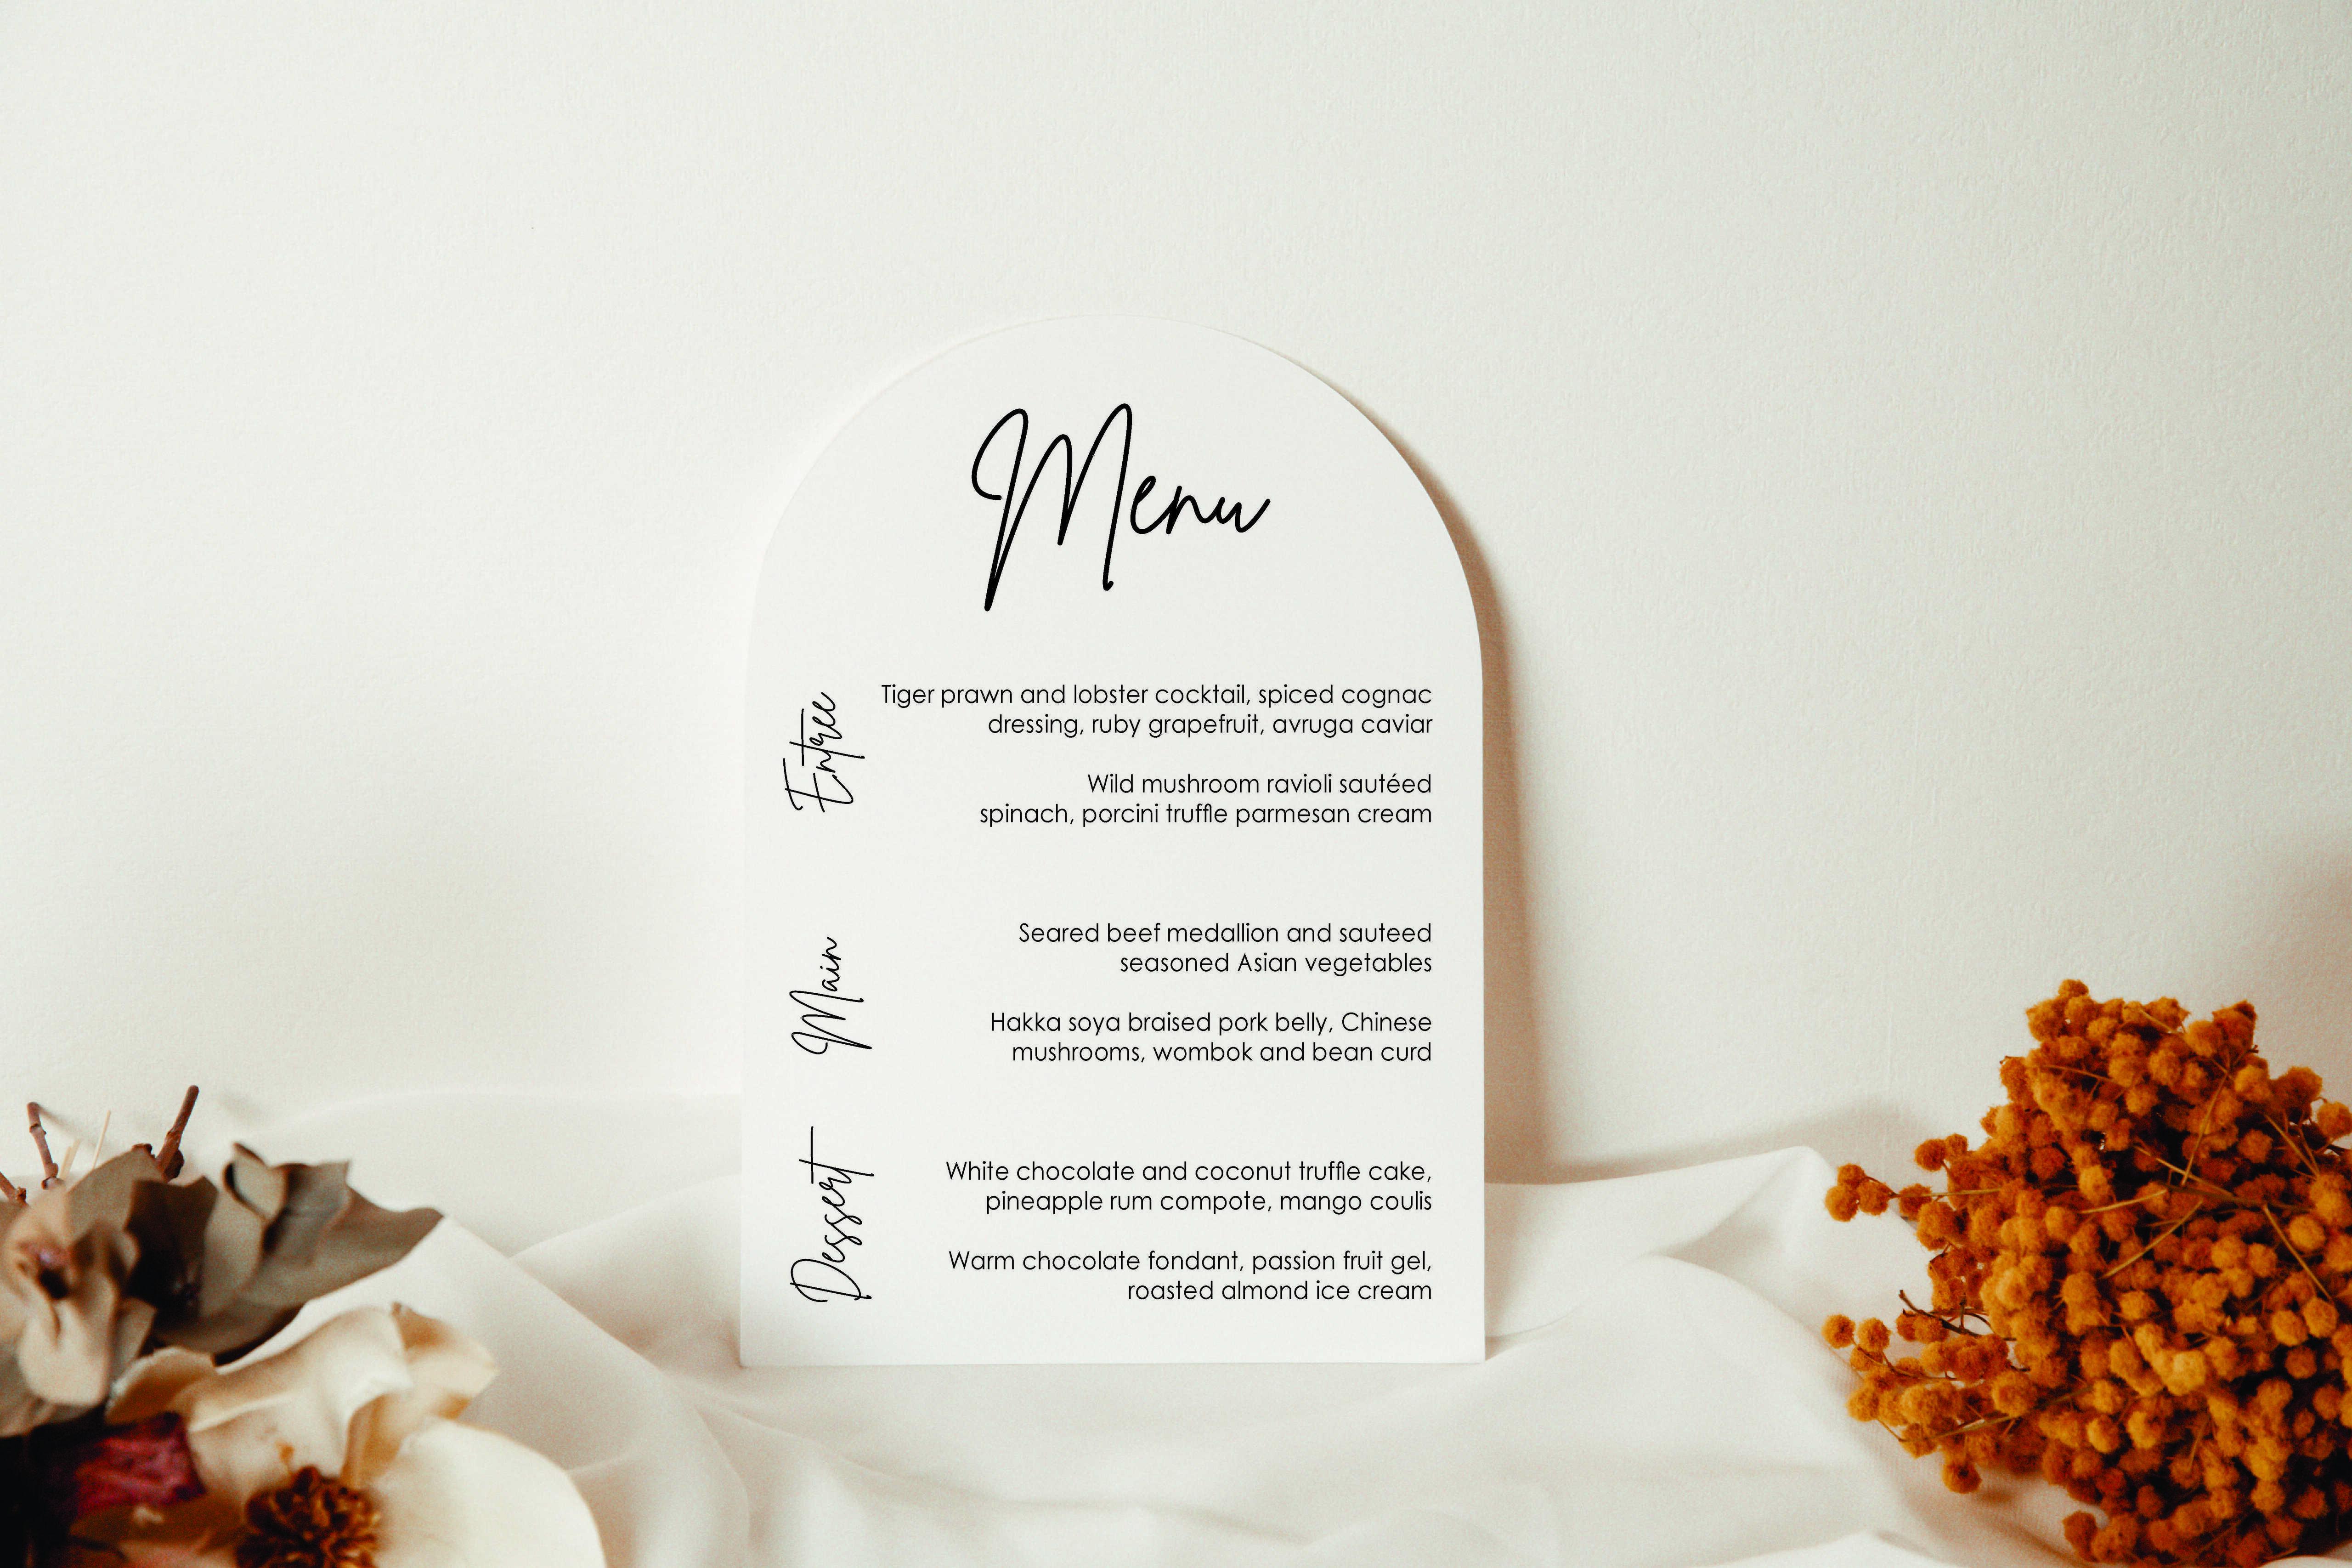 Side Table Menu acrylic sign